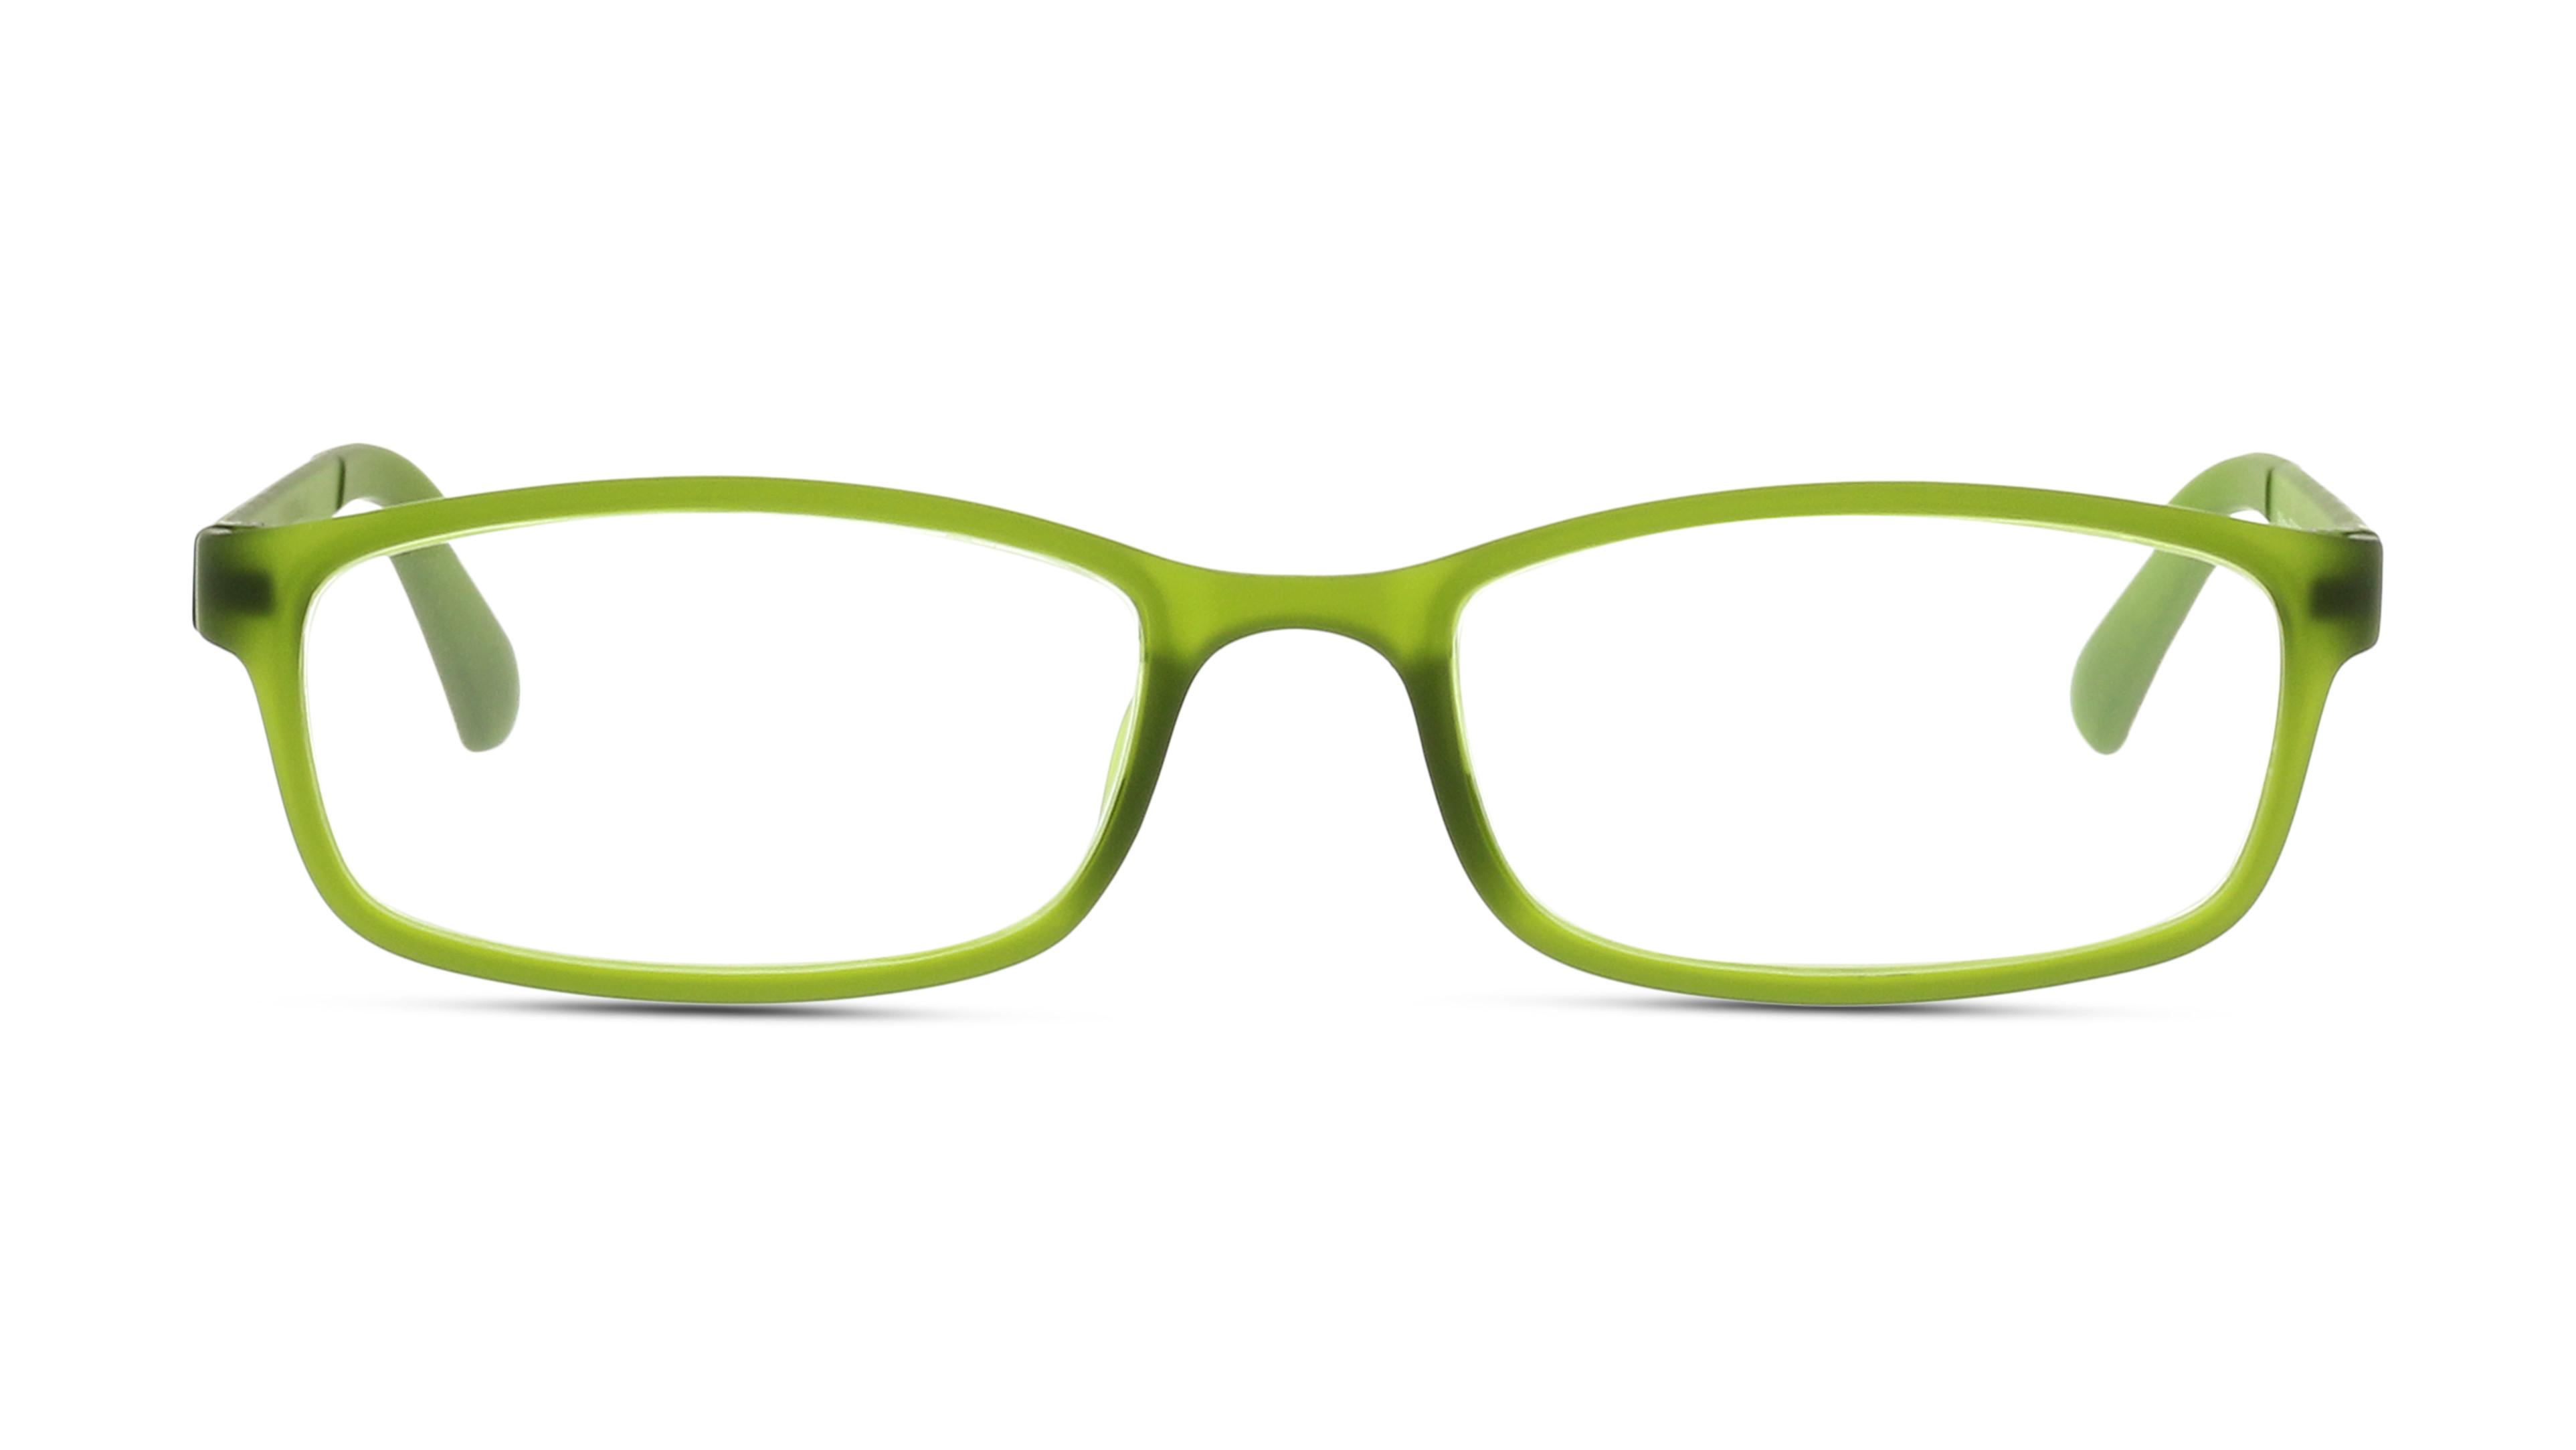 8719154524400-front-01-gv-library-hfcm06-Eyewear-green-green